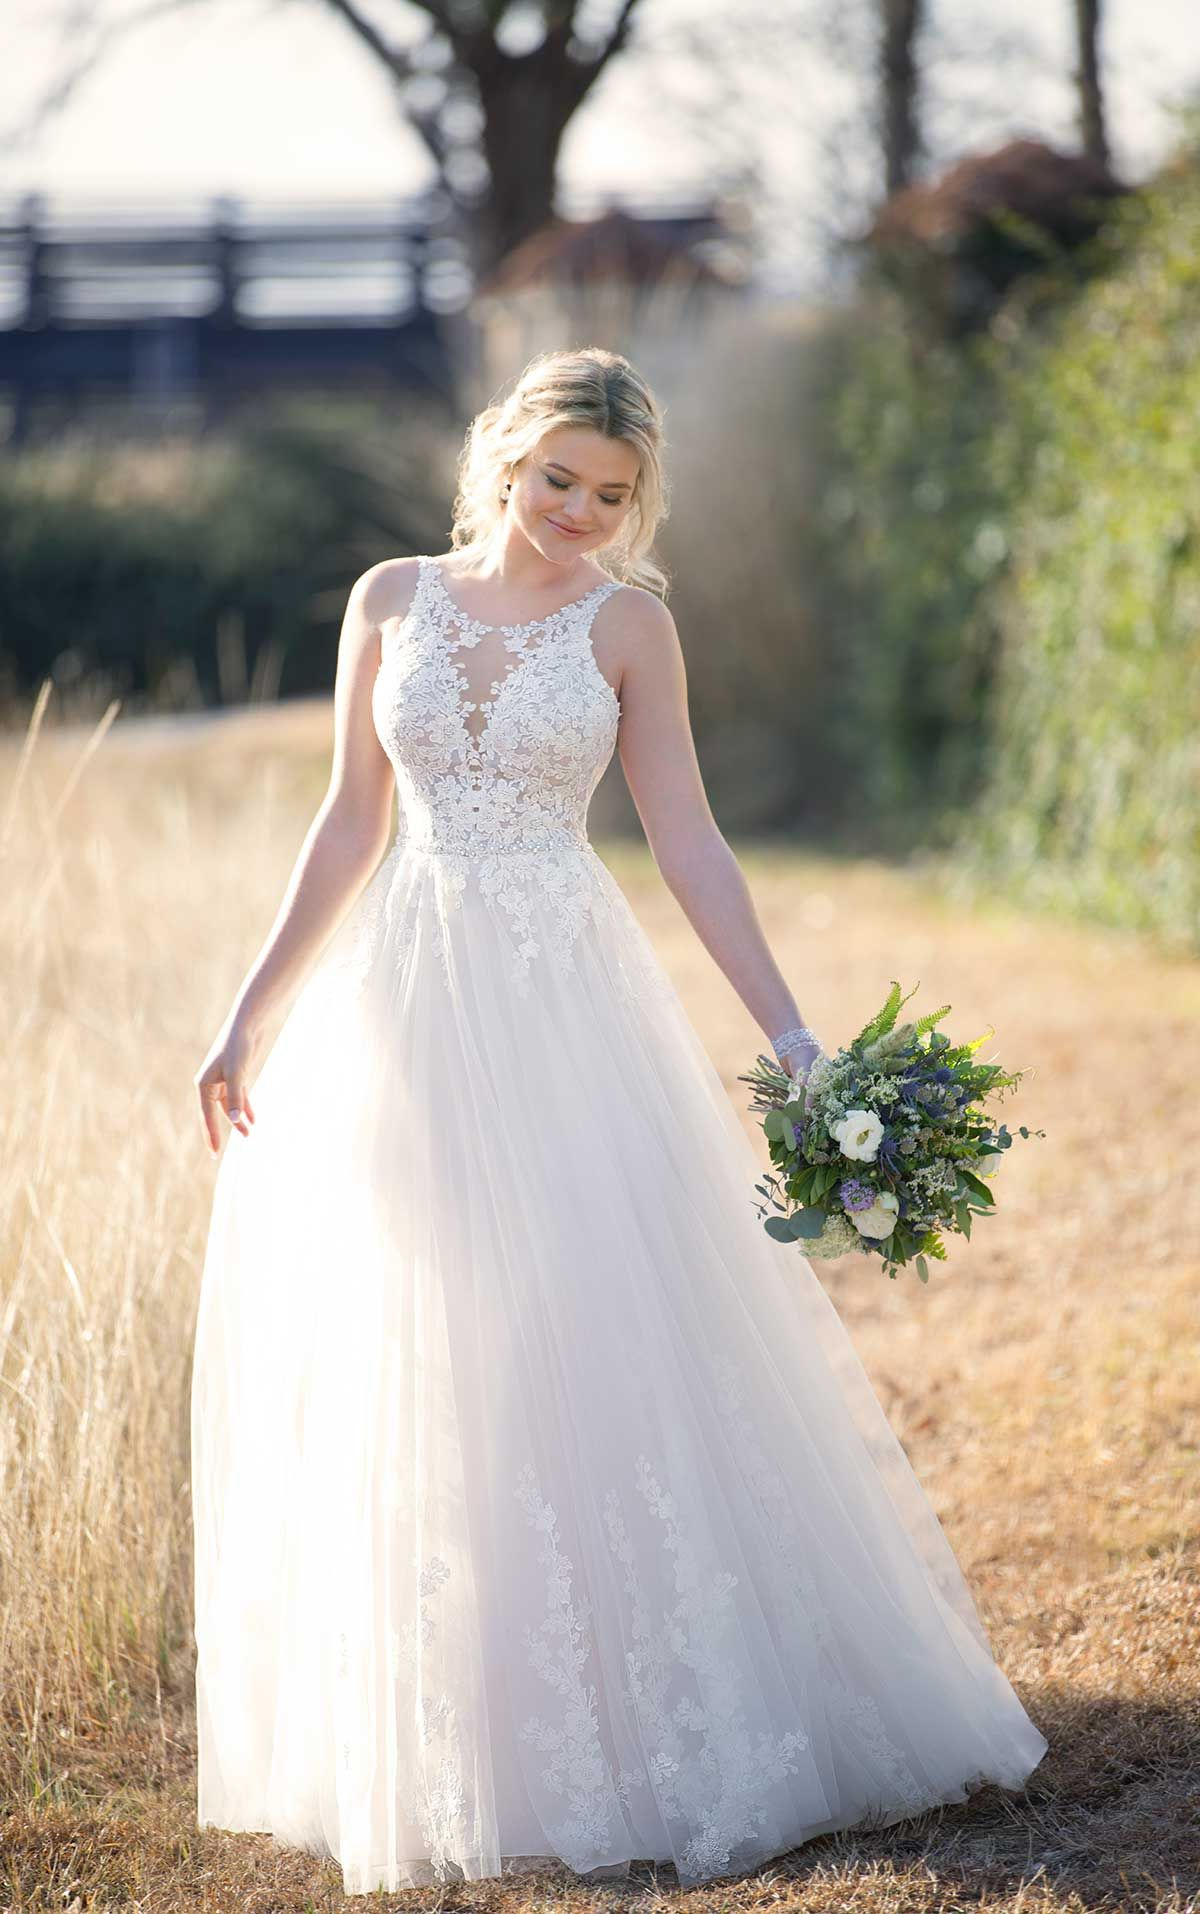 Mermaid Wedding Dress With Rich Beadwork Essense Of Australia Wedding Dresses Ball Gowns Wedding Aline Wedding Dress,Gorgeous Wedding Mermaid Wedding Dresses 2020